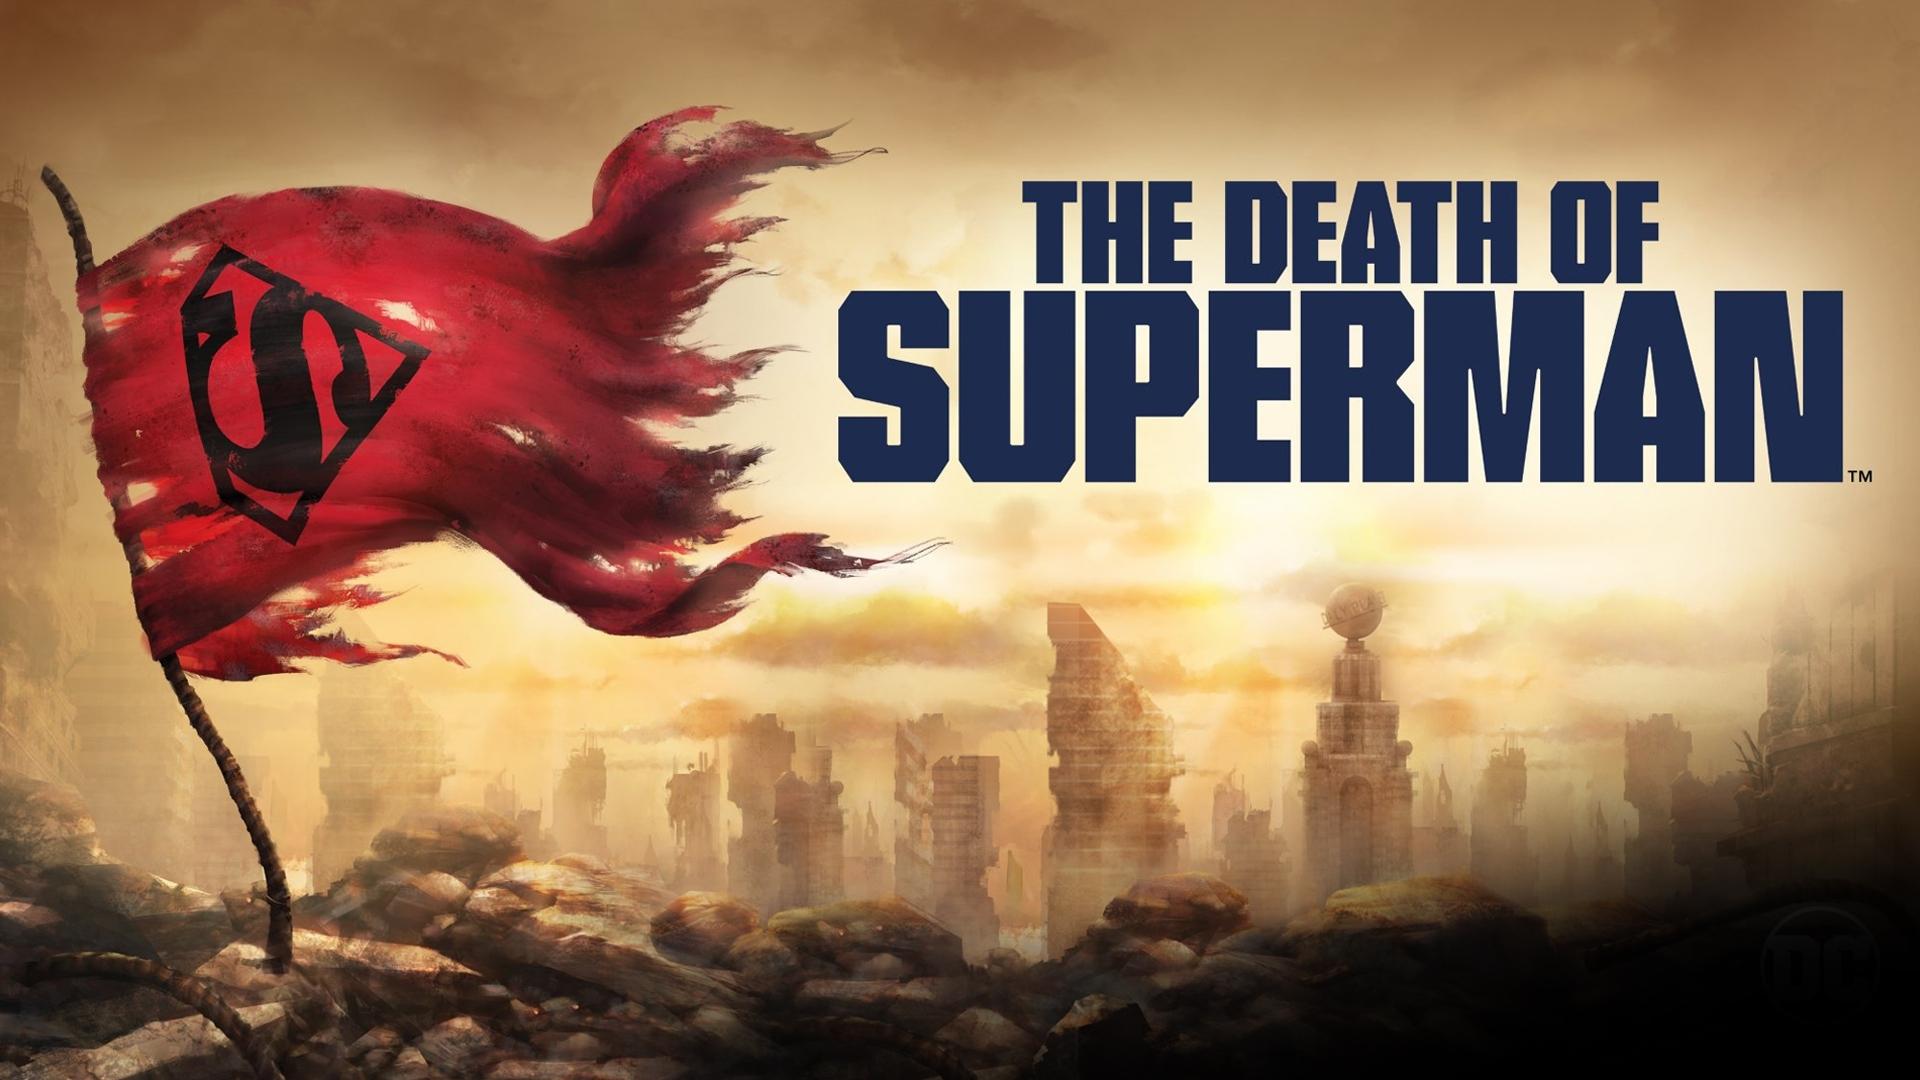 The Death of Superman The Death of Superman